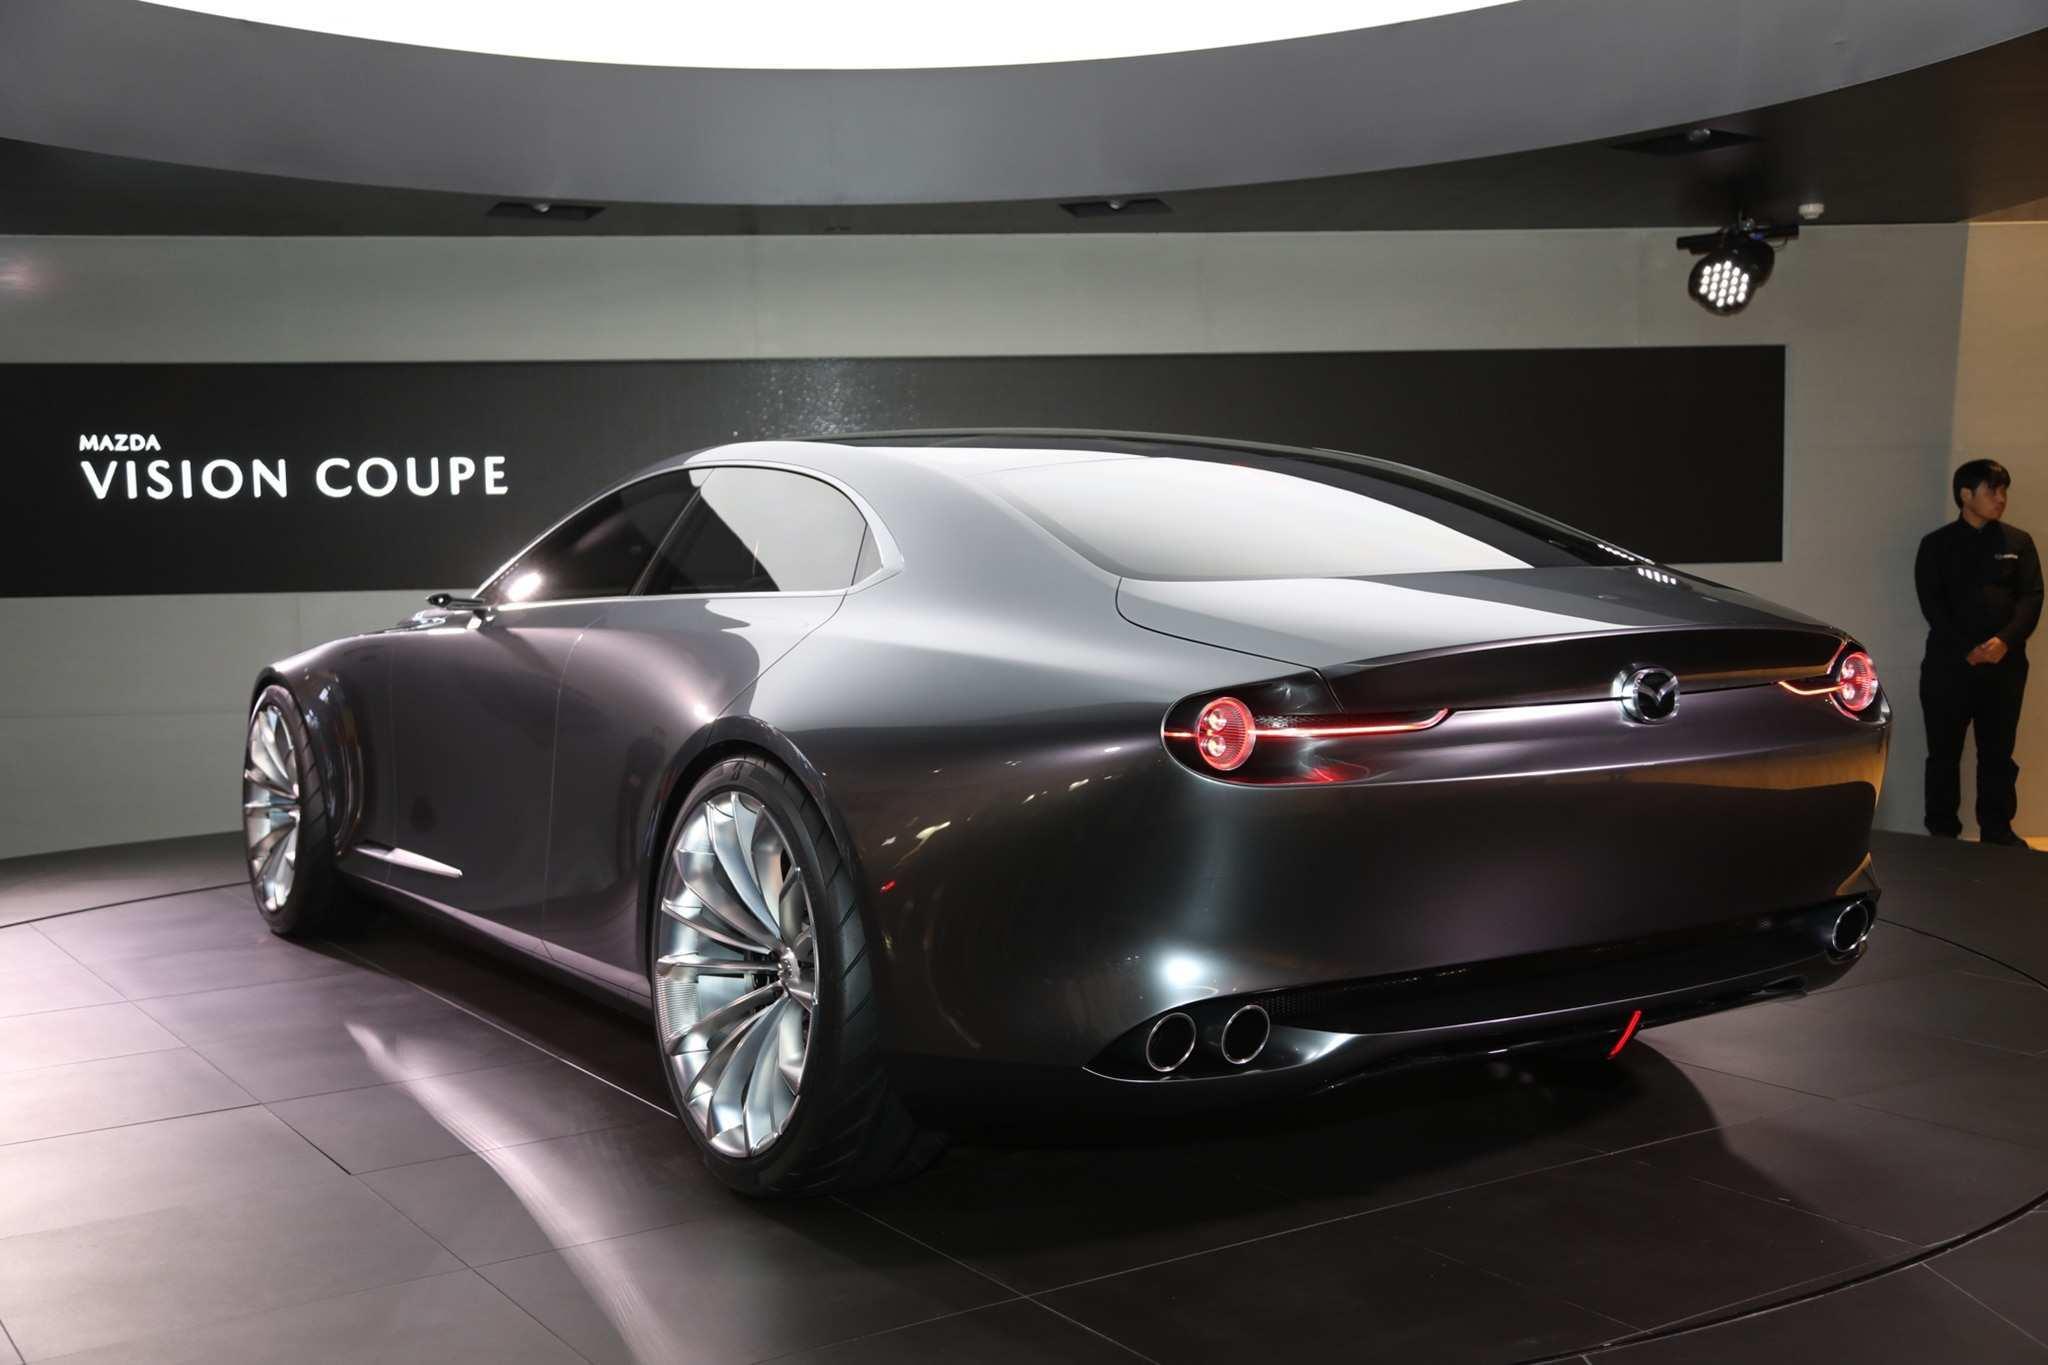 99 Gallery of 2020 Mazda Vision Spesification for 2020 Mazda Vision